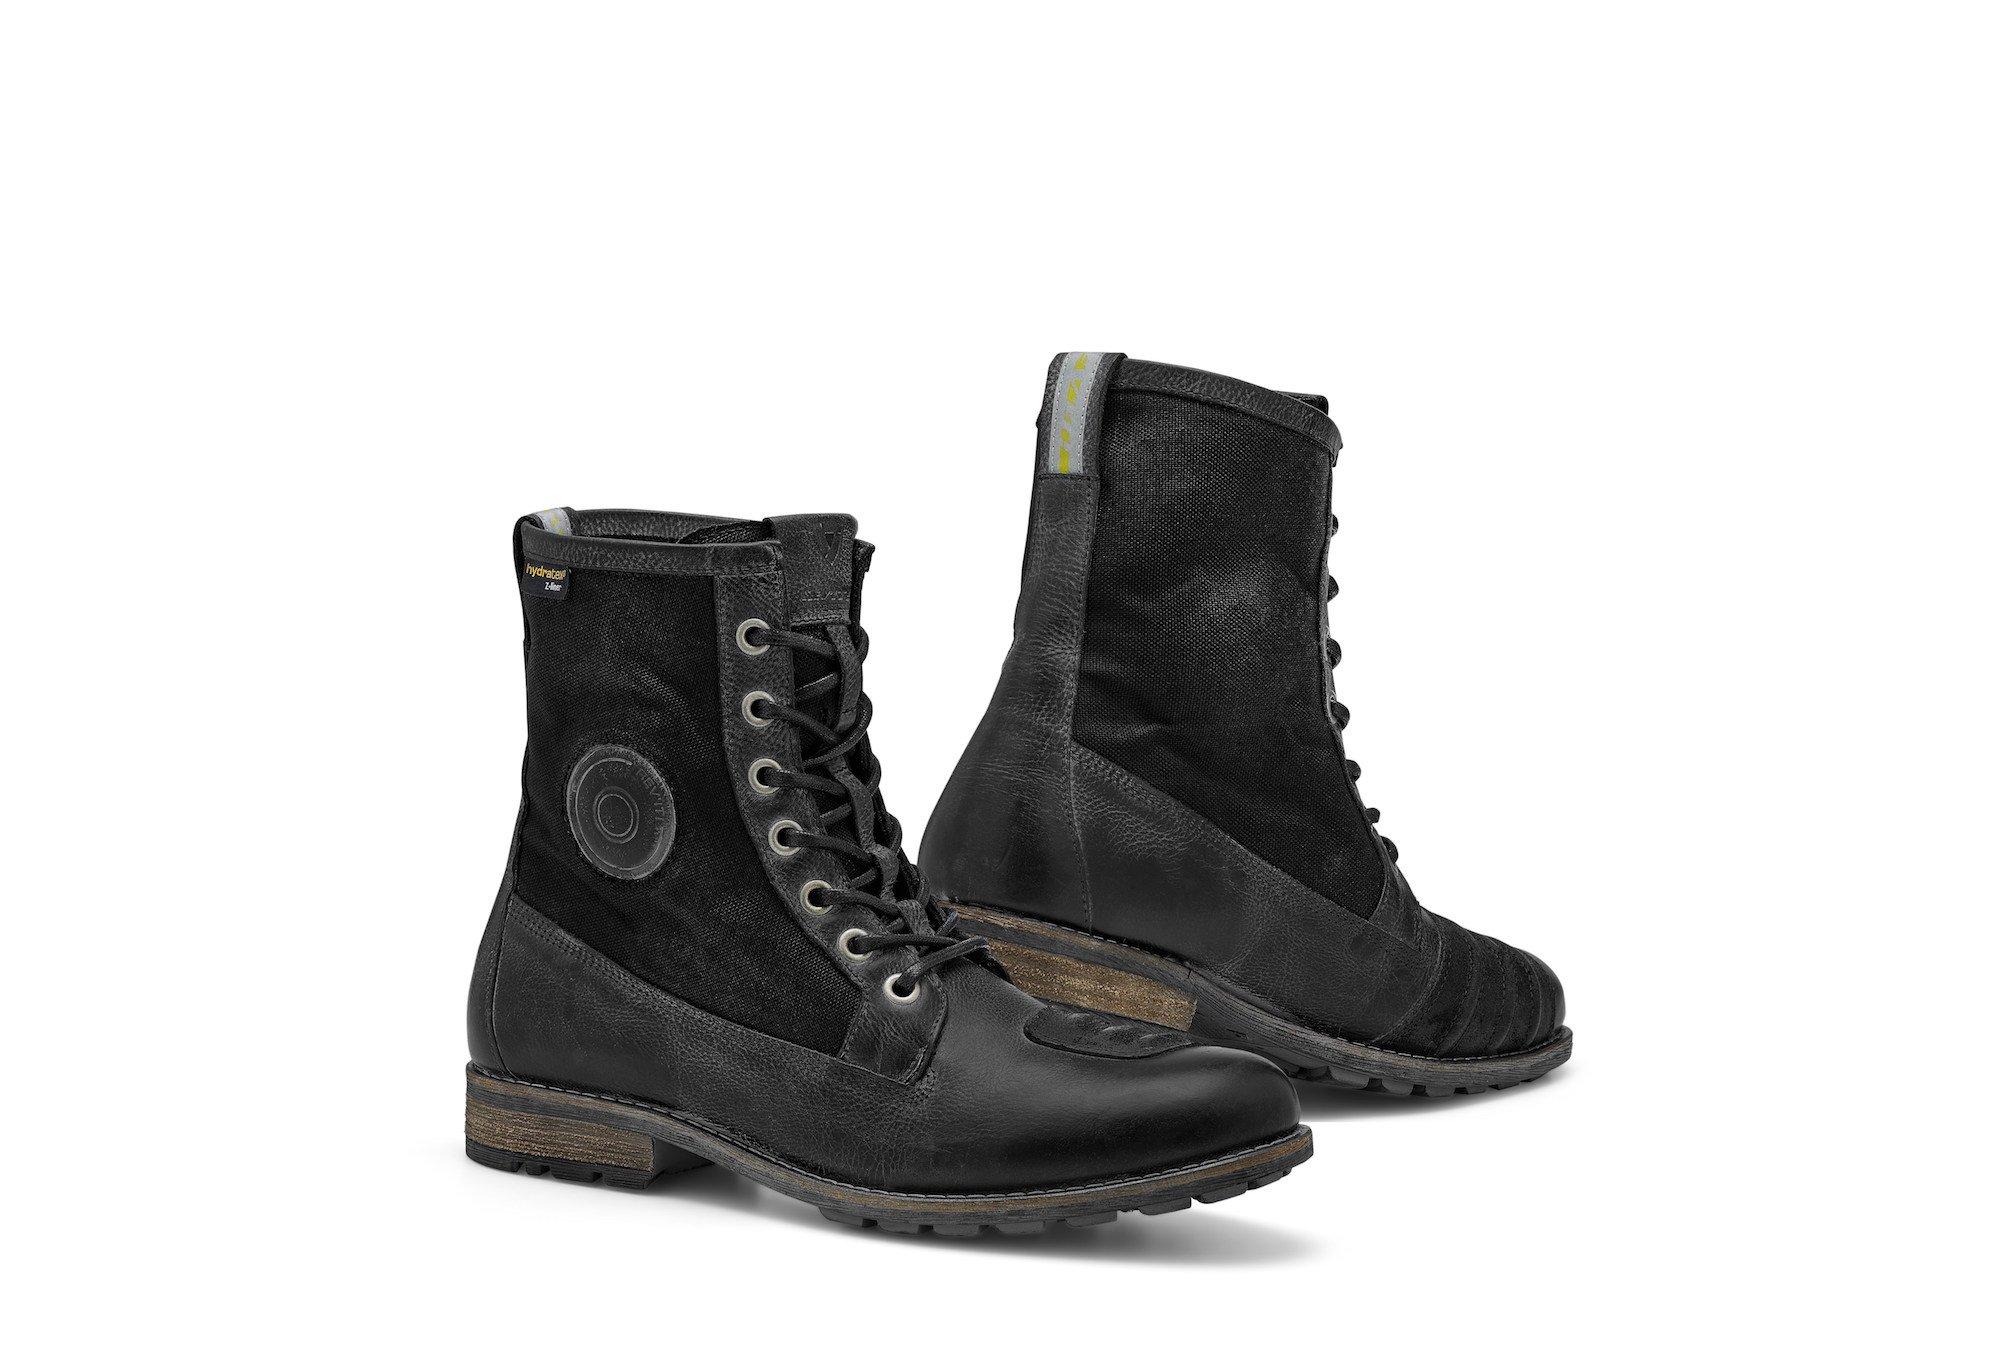 Ebay Motors Motorcycles >> REV'IT! Regent Boots